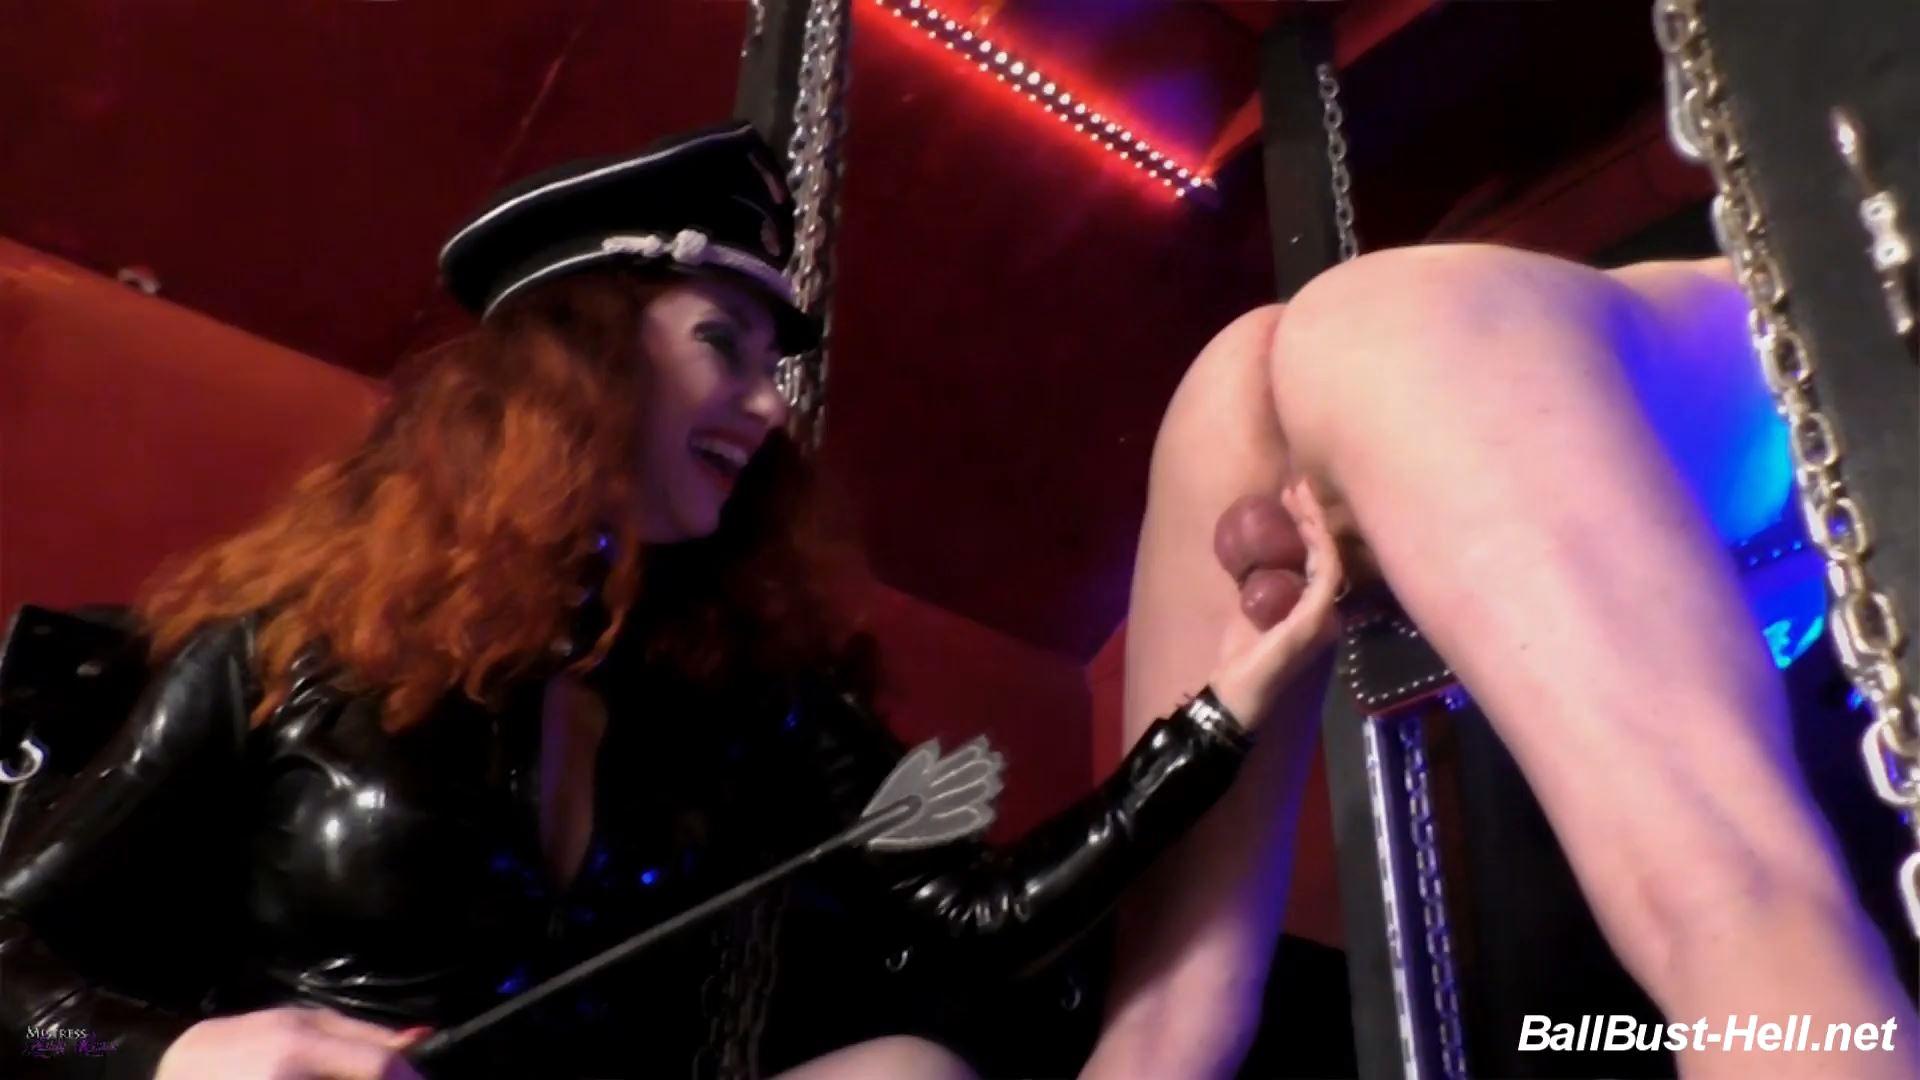 Mistress Lady Renee In Scene: Play ball - MistressLadyRenee - FULL HD/1080p/MP4